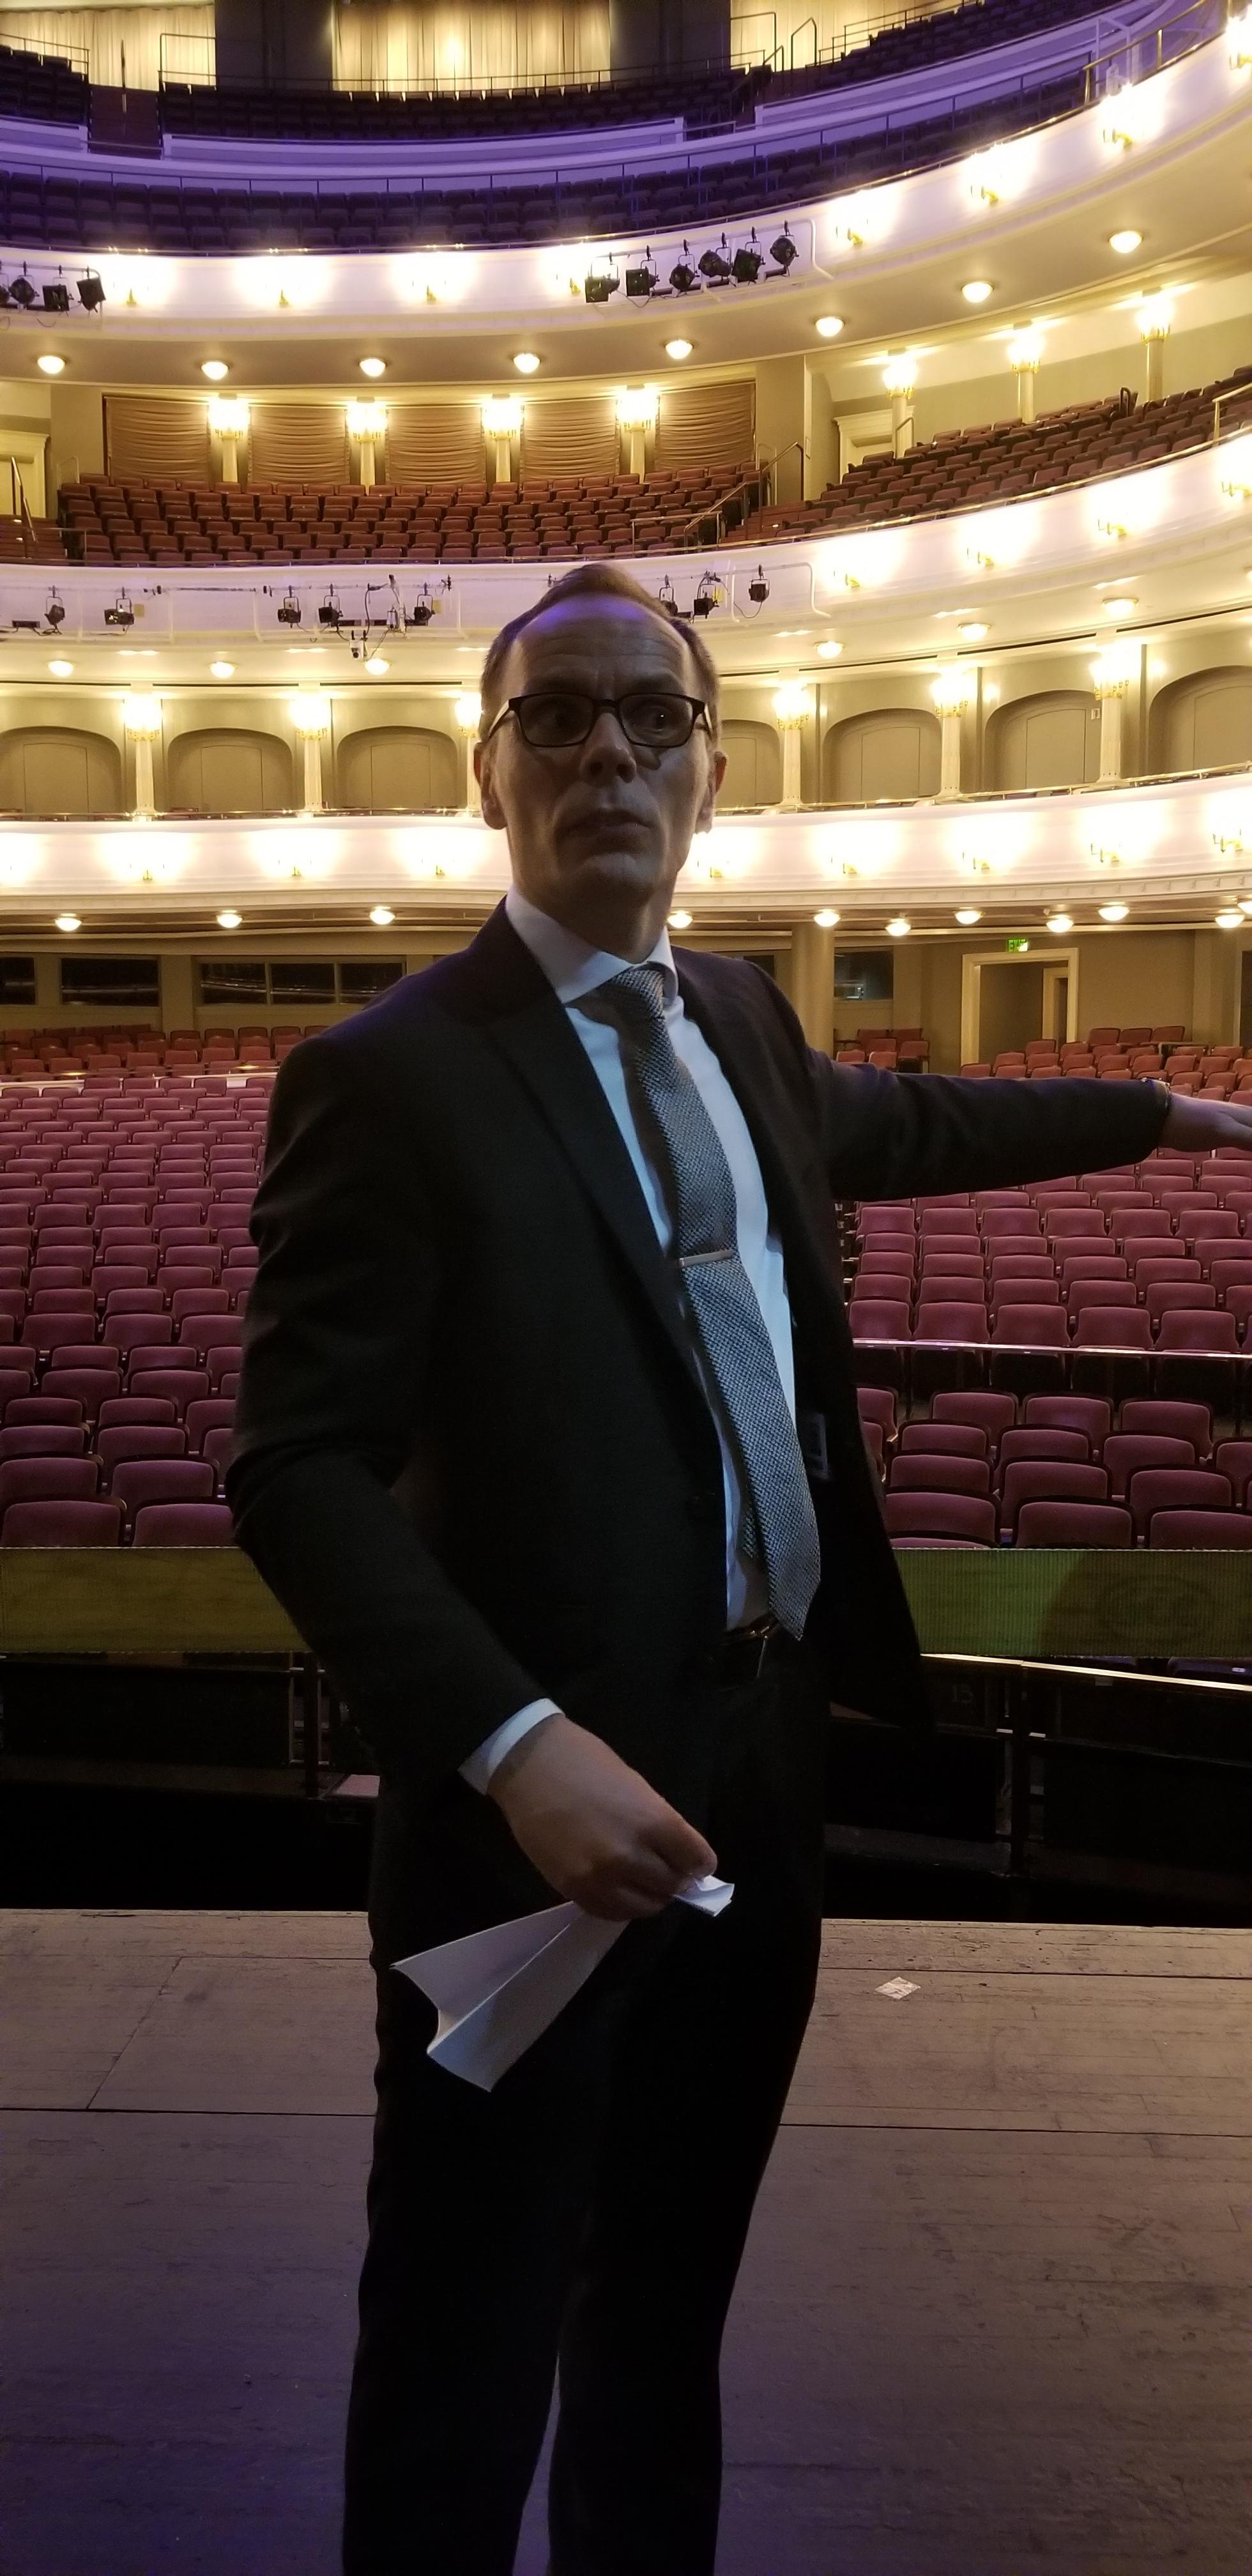 Tuomas Hiltunen - General Director - Photo by Aino Aaltonen